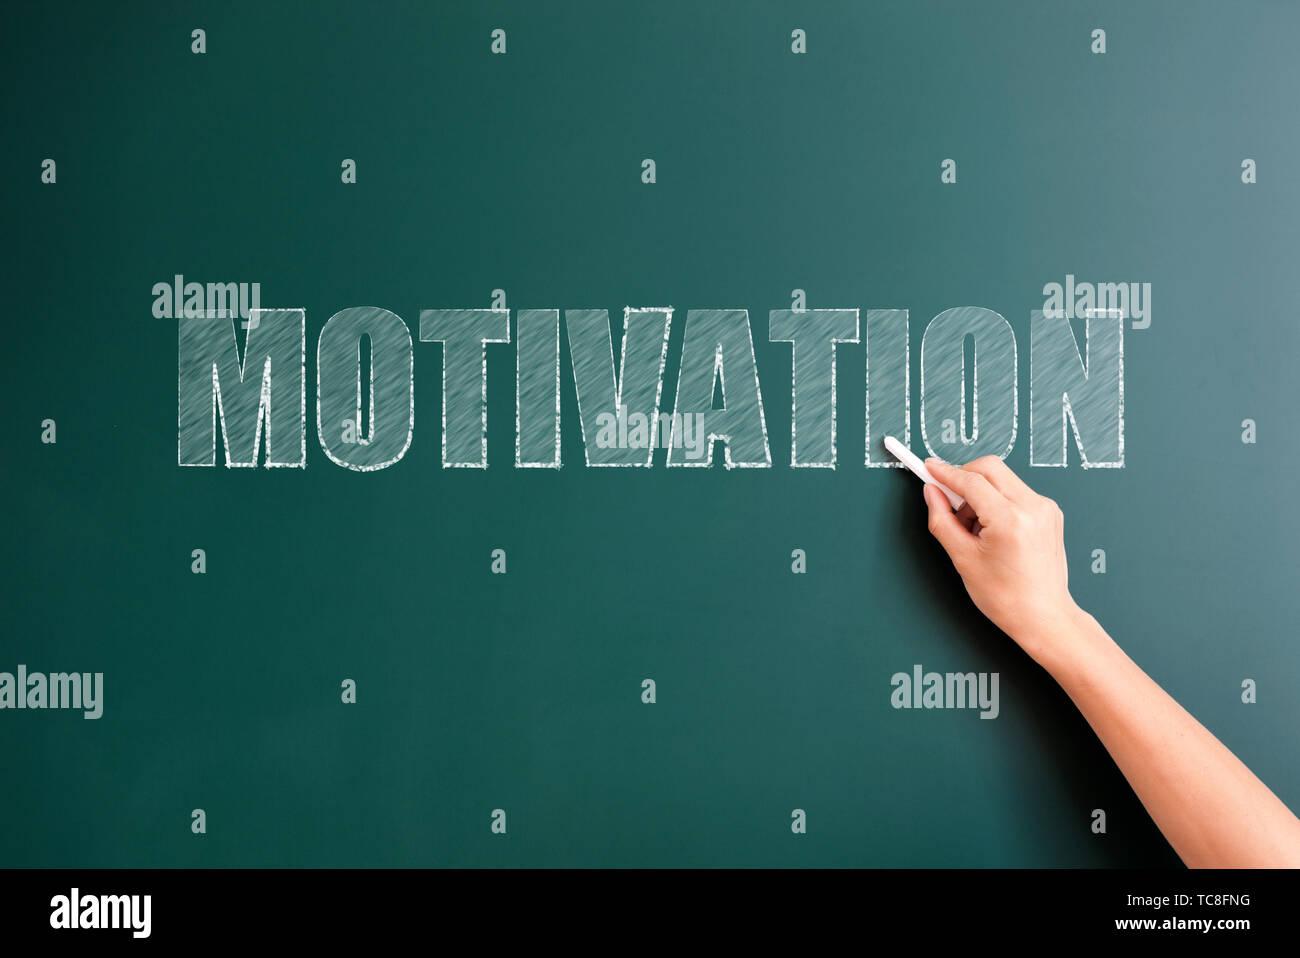 motivation written on blackboard - Stock Image